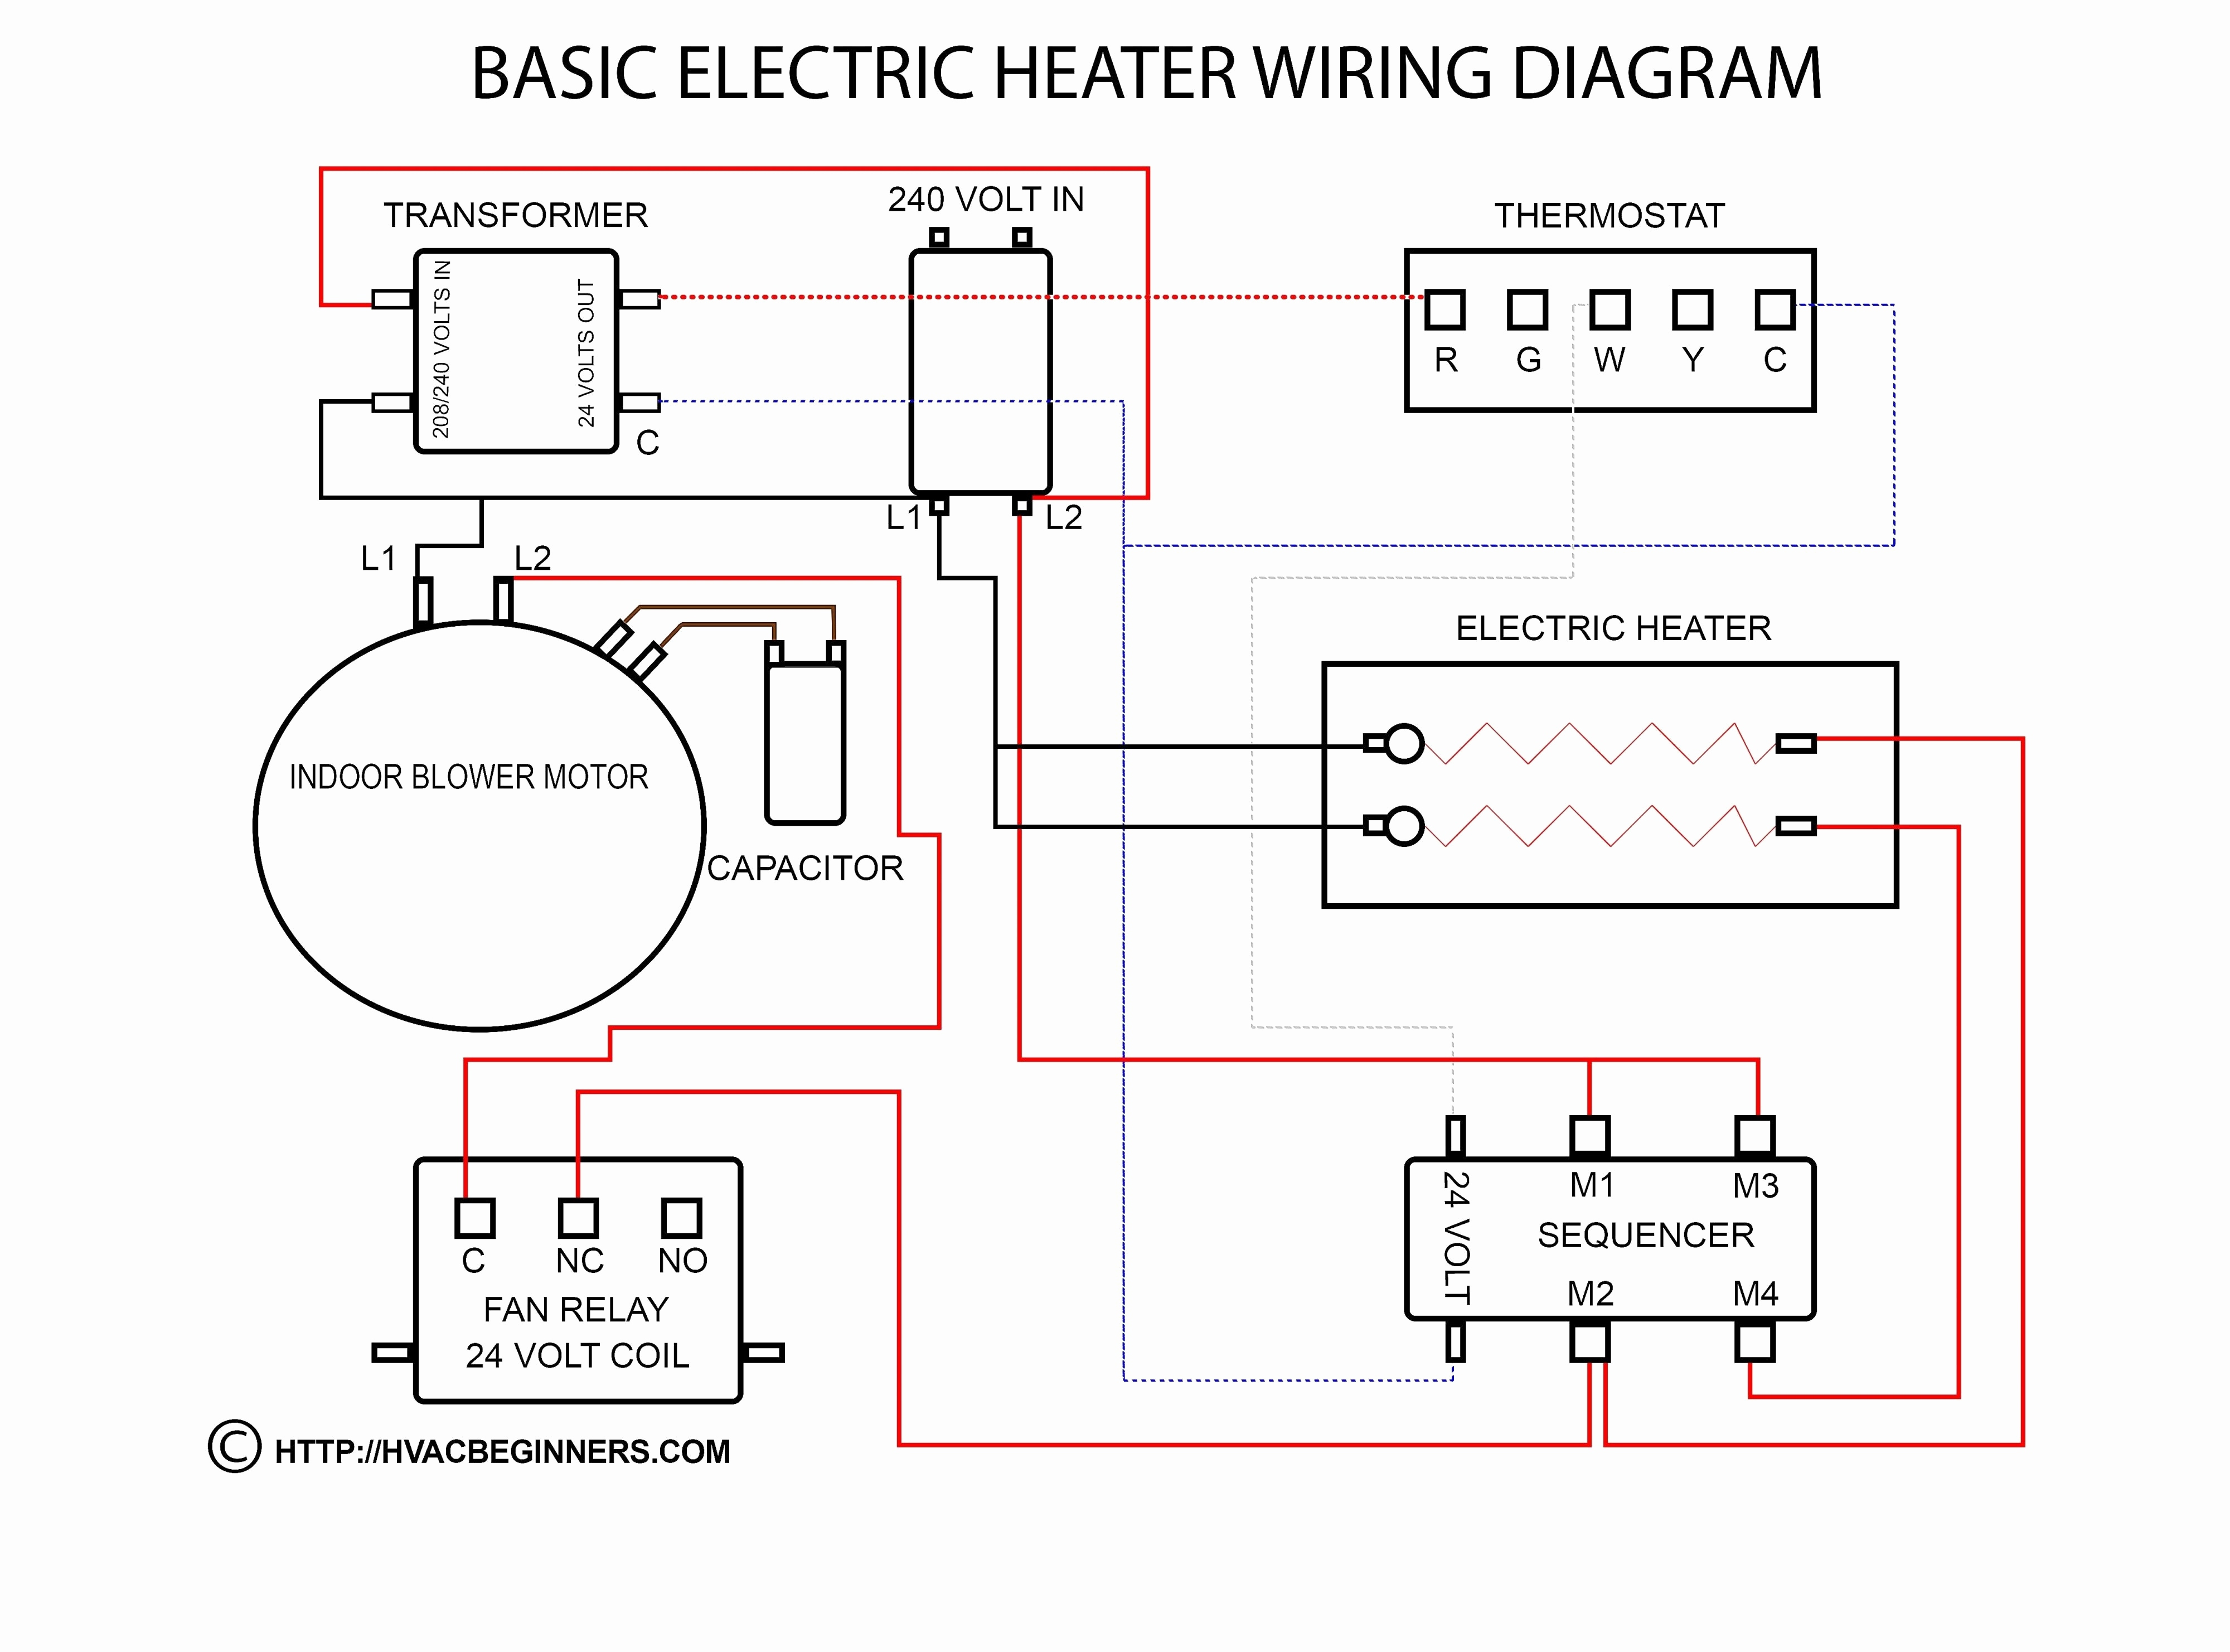 8 Best Of 36 Volt Trolling Motor Wiring Diagram Images | Simple - 12 24 Volt Trolling Motor Wiring Diagram